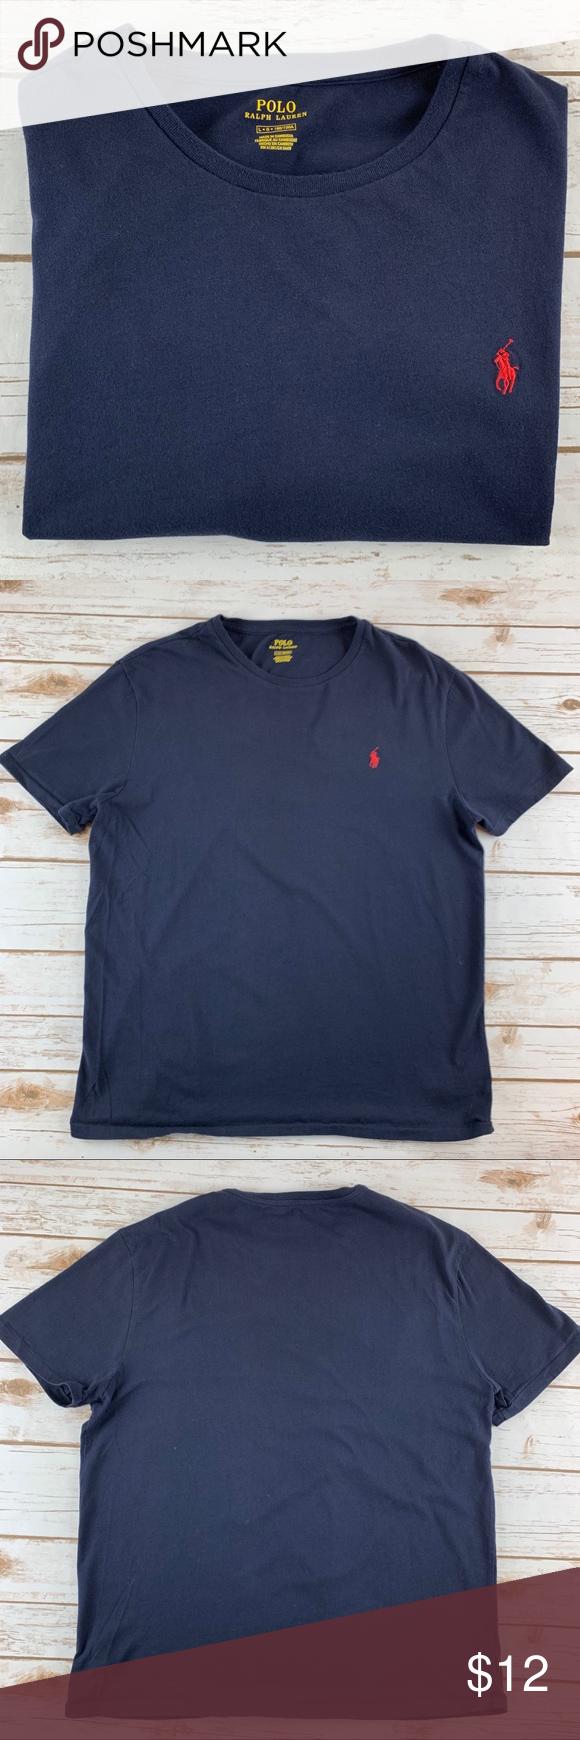 9a549e161 Polo Ralph Lauren Men's Crew Neck T-Shirt 🐎 Polo Ralph Lauren men's crew neck  T-shirt Crew neck line. Short sleeves. Classic fit.